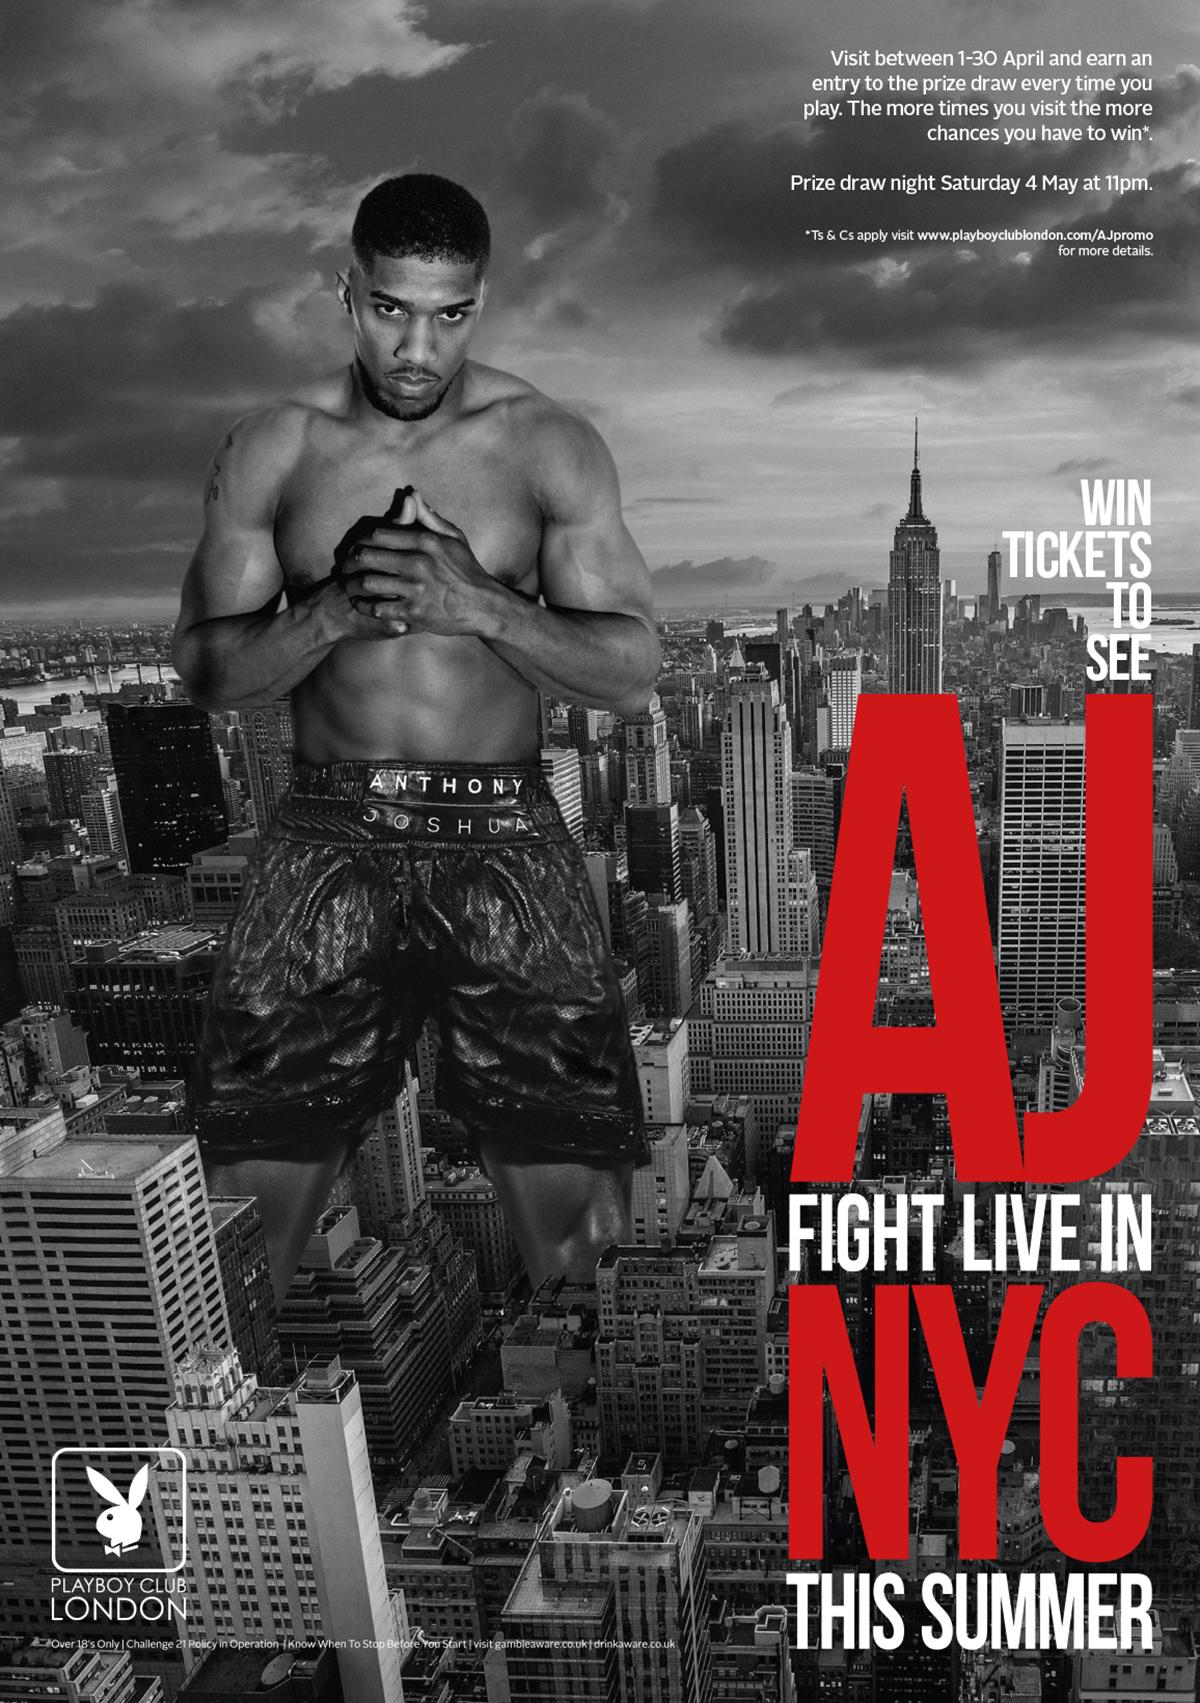 AJ-NYC-Promo-A1-Poster-PRINT.jpg